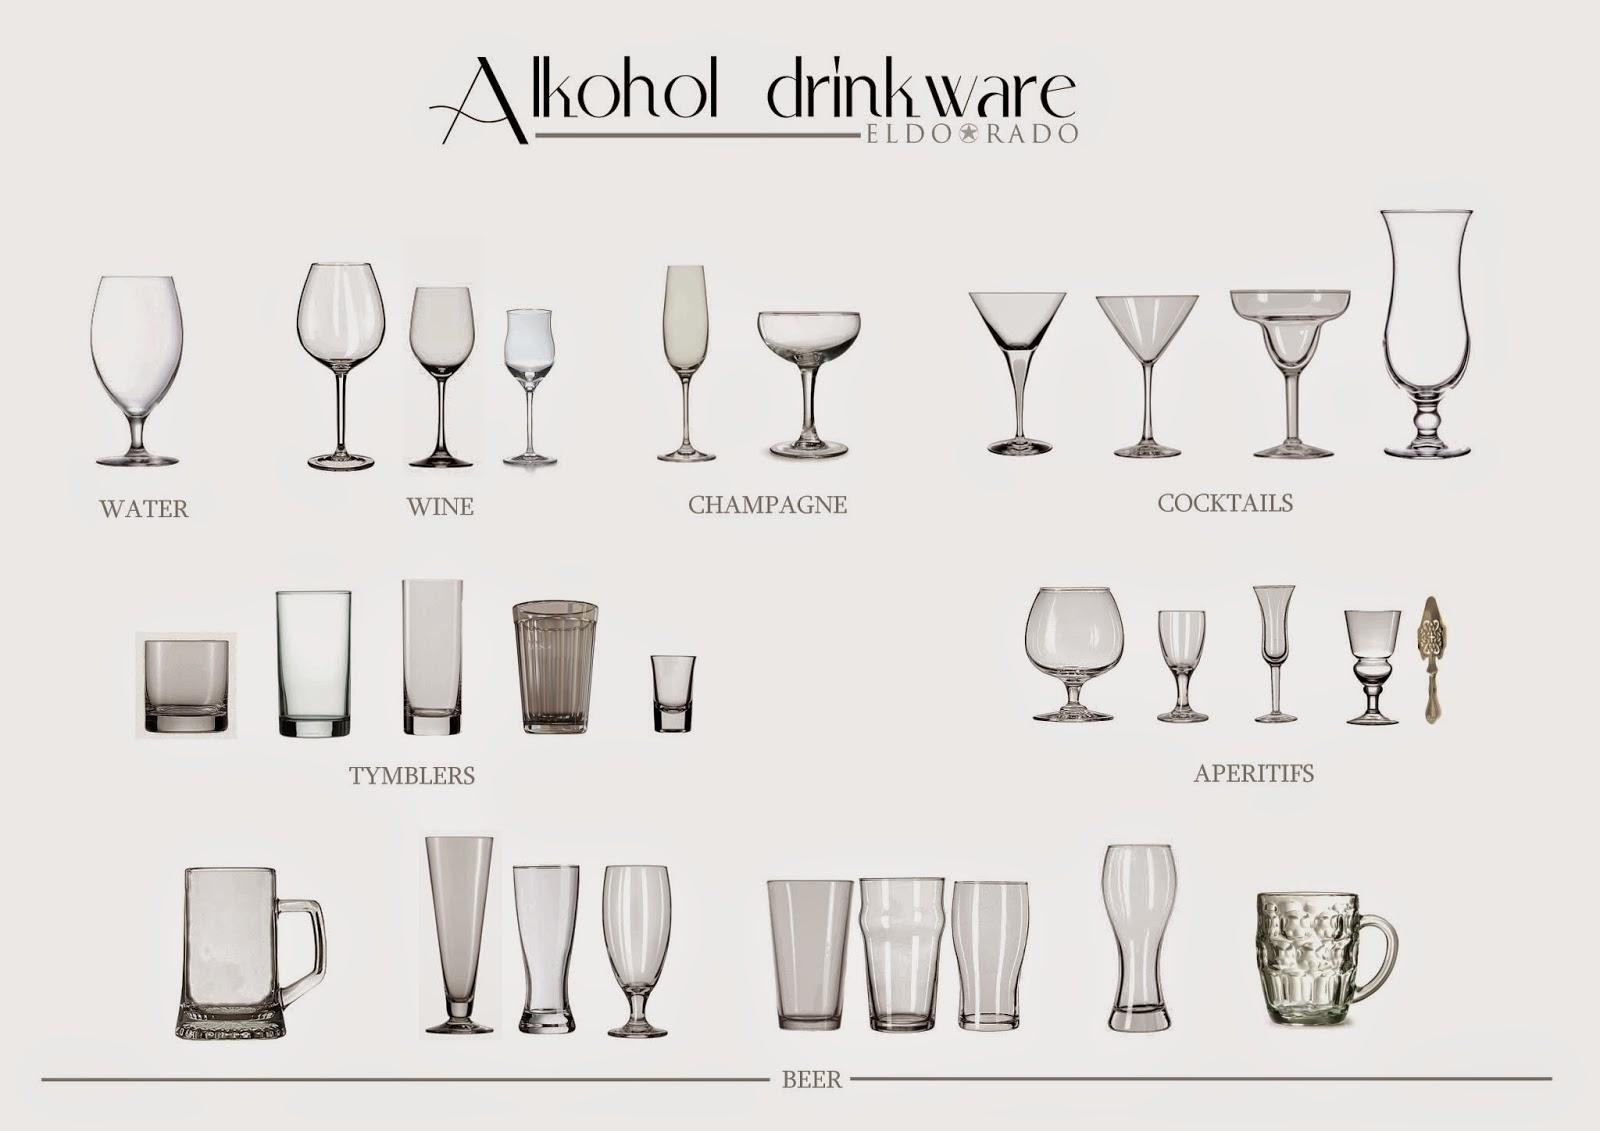 etiquette guide for glassware. Black Bedroom Furniture Sets. Home Design Ideas